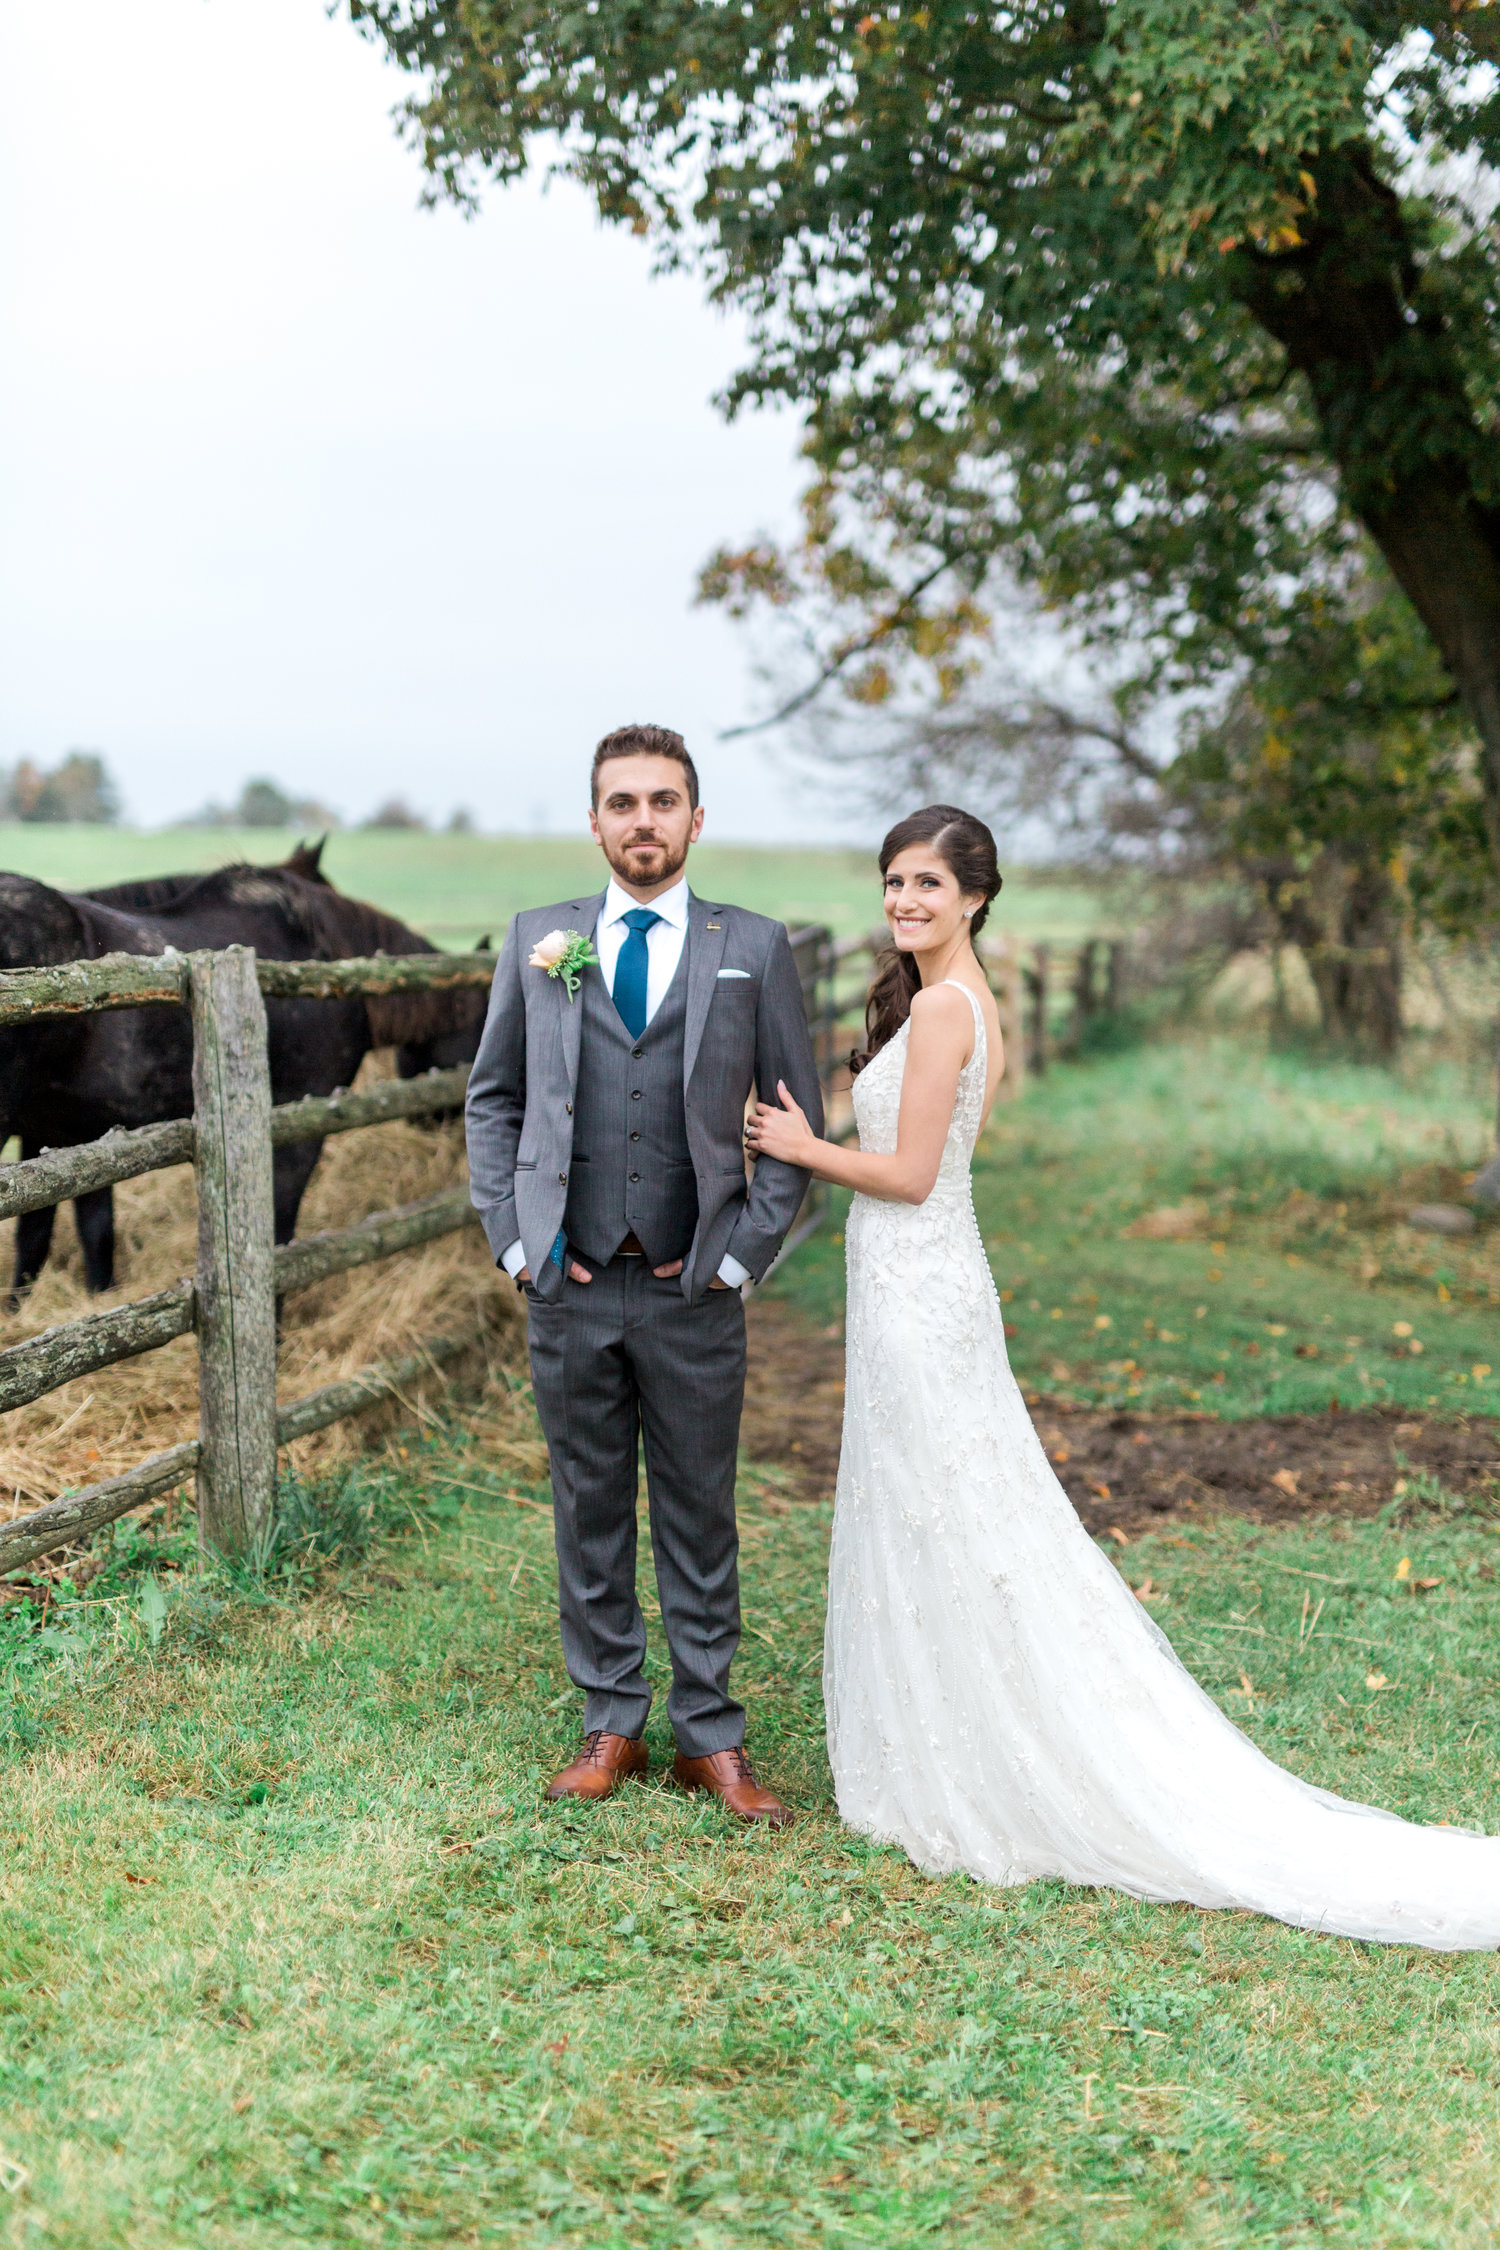 Amir-Golbazi-Danielle-Giroux-Photography_Toronto-Wedding_Cedarwood_Rachel-Paul_556.jpg